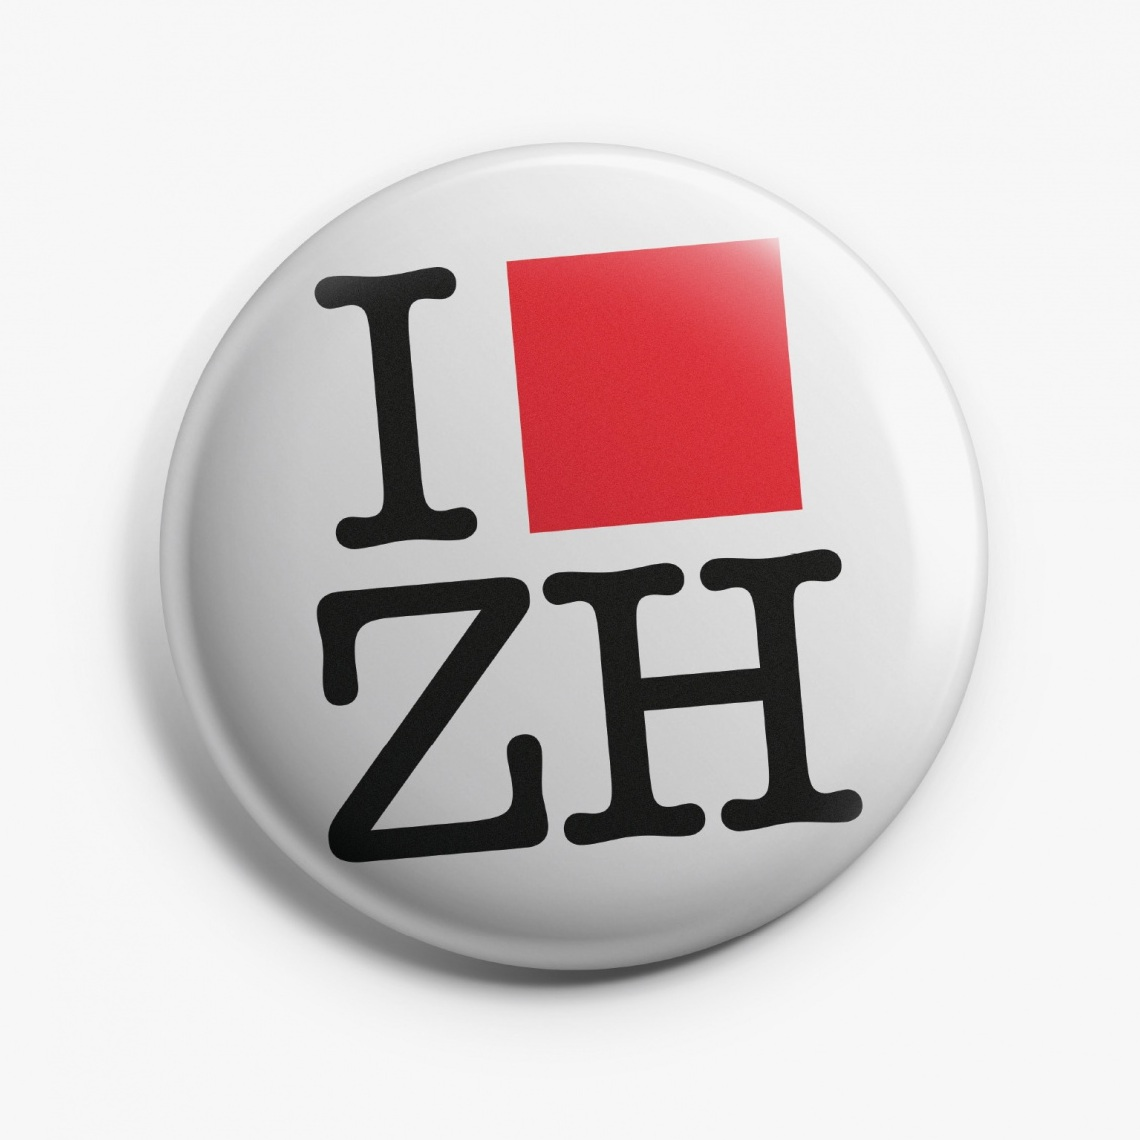 haus-konstruktiv_button_1.jpg